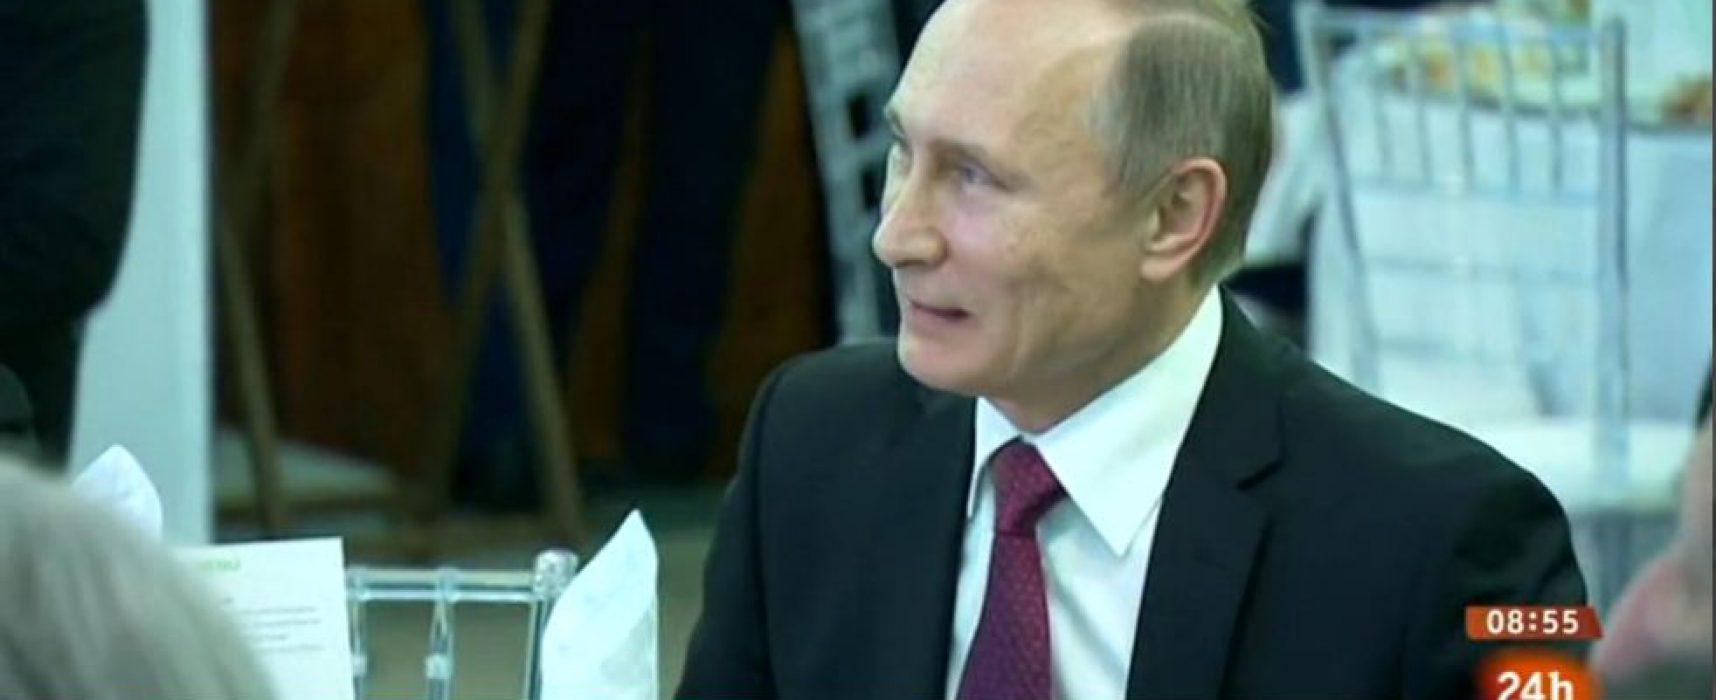 El reportaje del programa '24h' de RTVE sobre la propaganda rusa